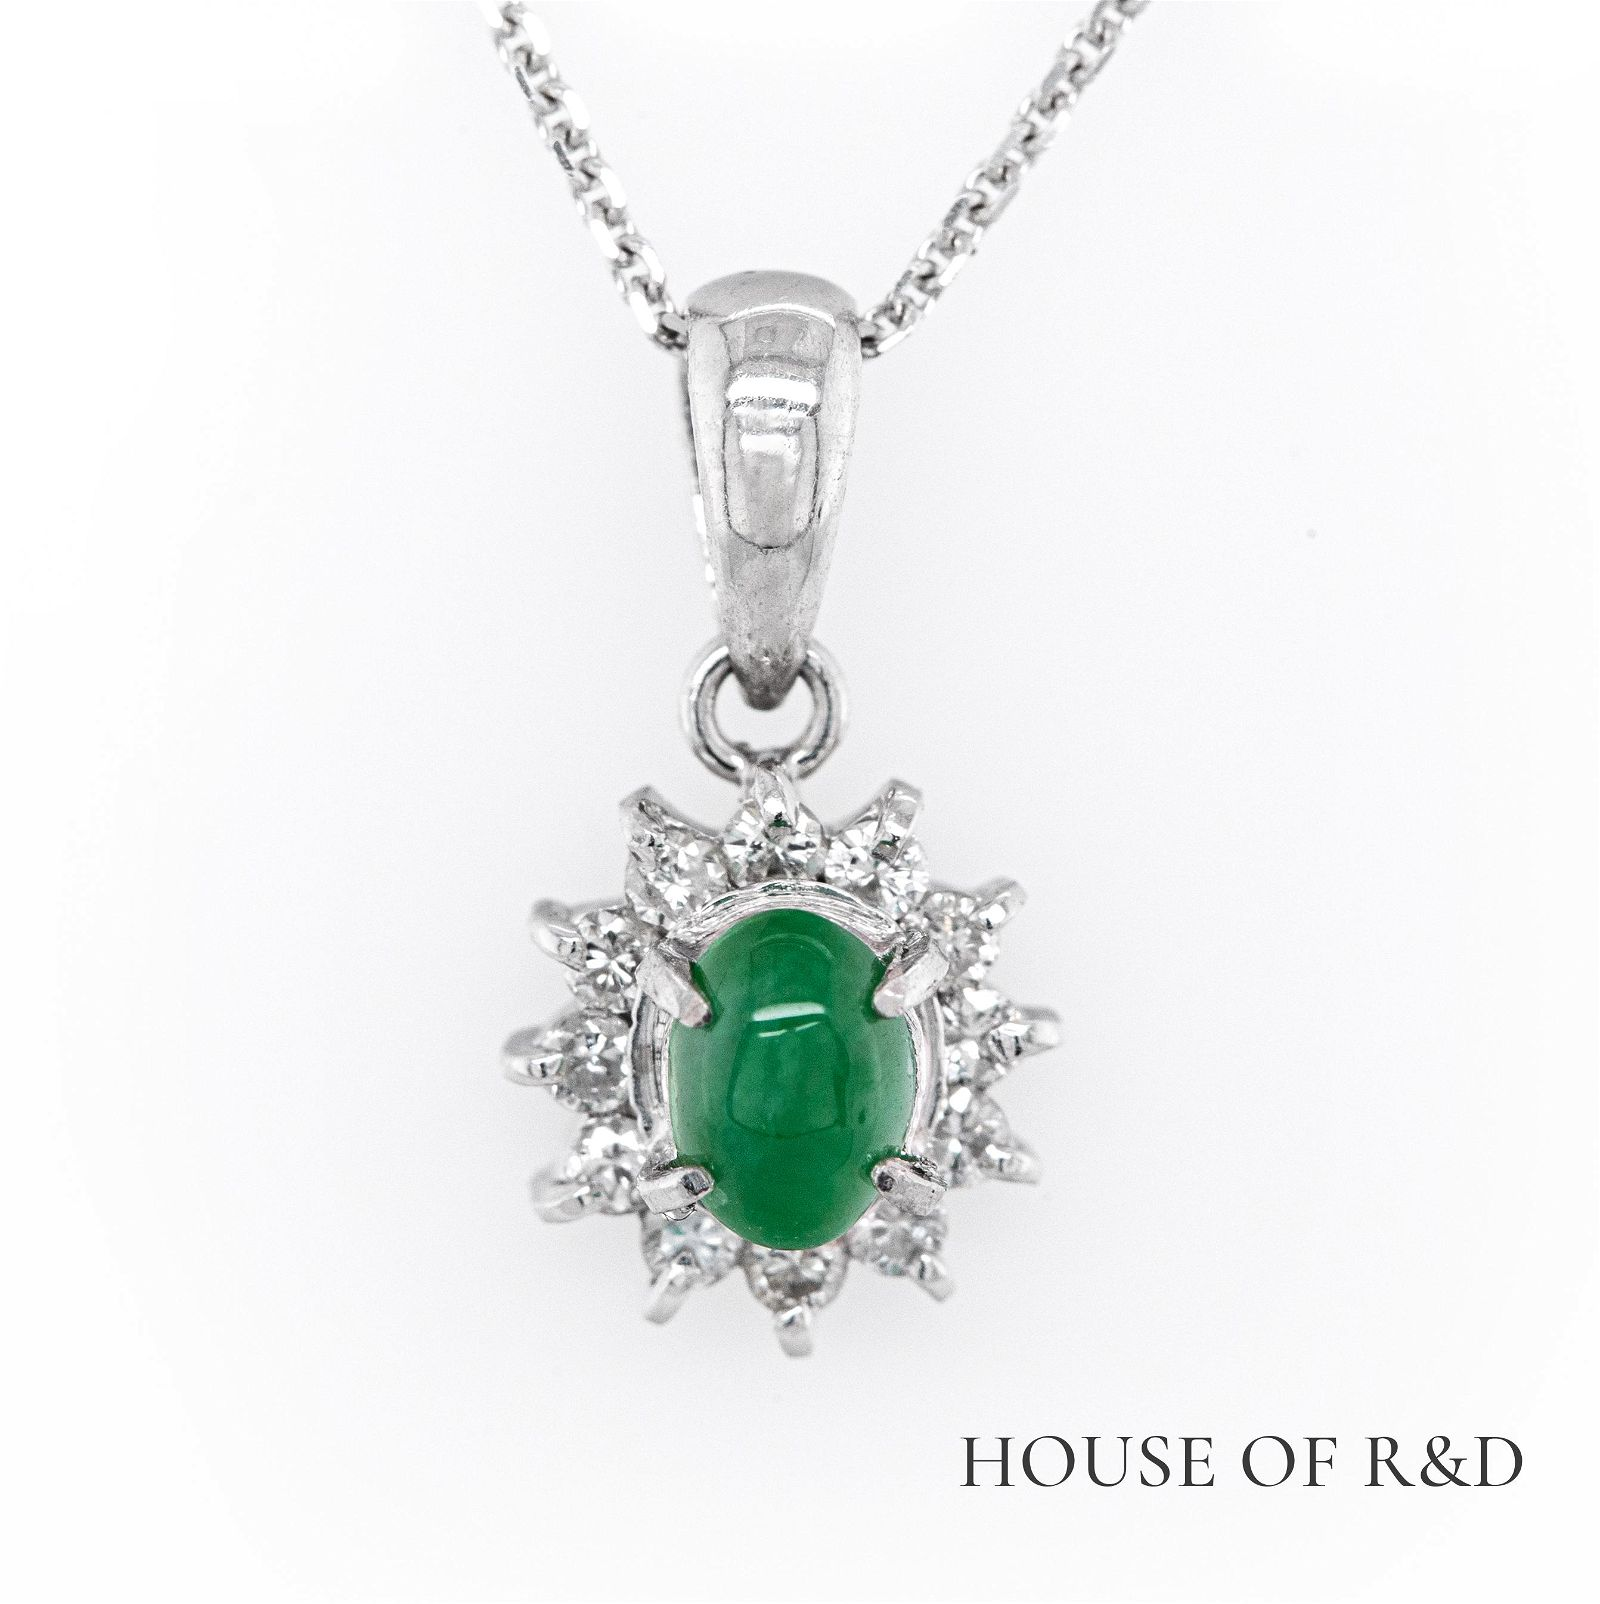 14k White Gold - 0.36tcw -  Jade & Diamonds Pendant